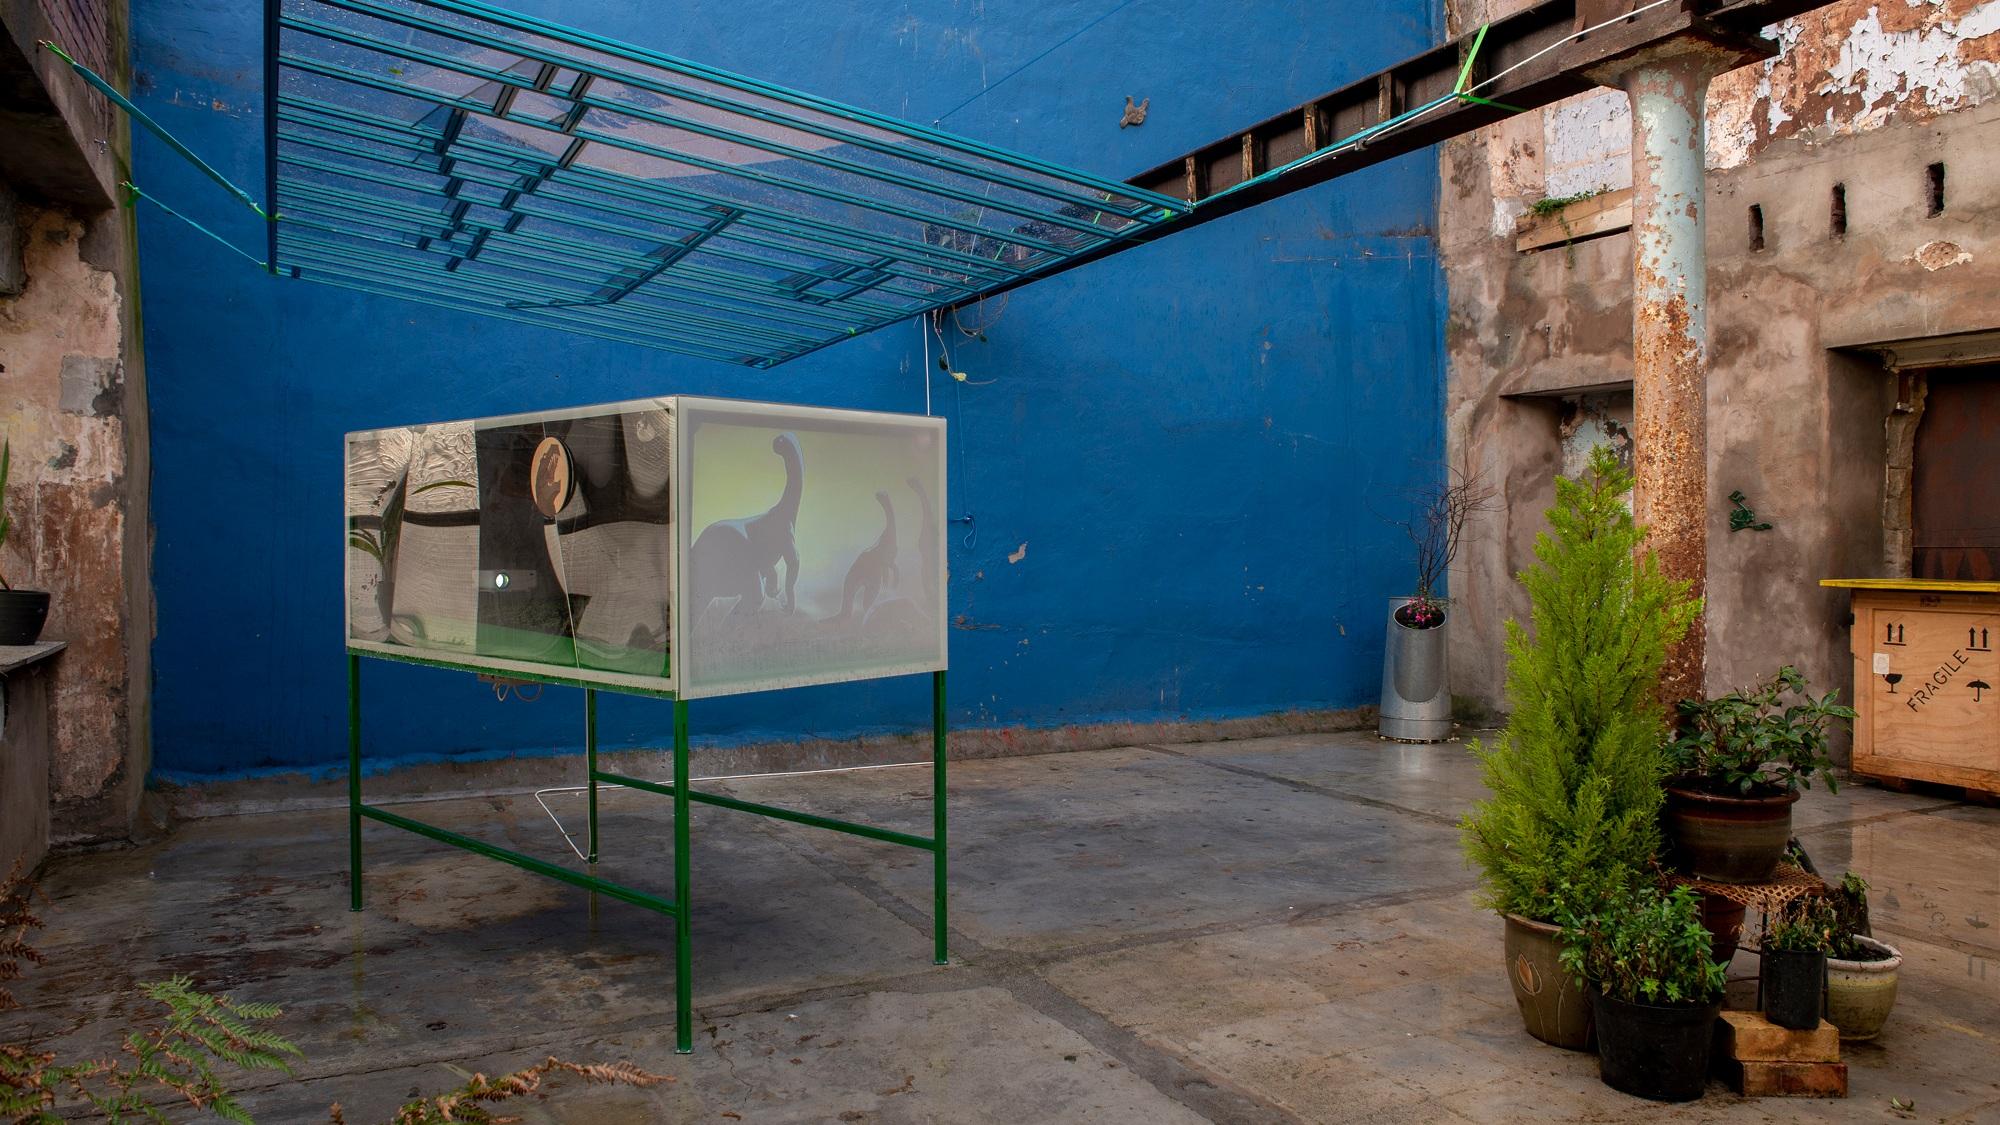 2 Mirko Canesi, Contra, Cinema for Basil, Mirko Canesi, Contra, Garden, 2018 at David Dale Gallery, Glasgow.jpg